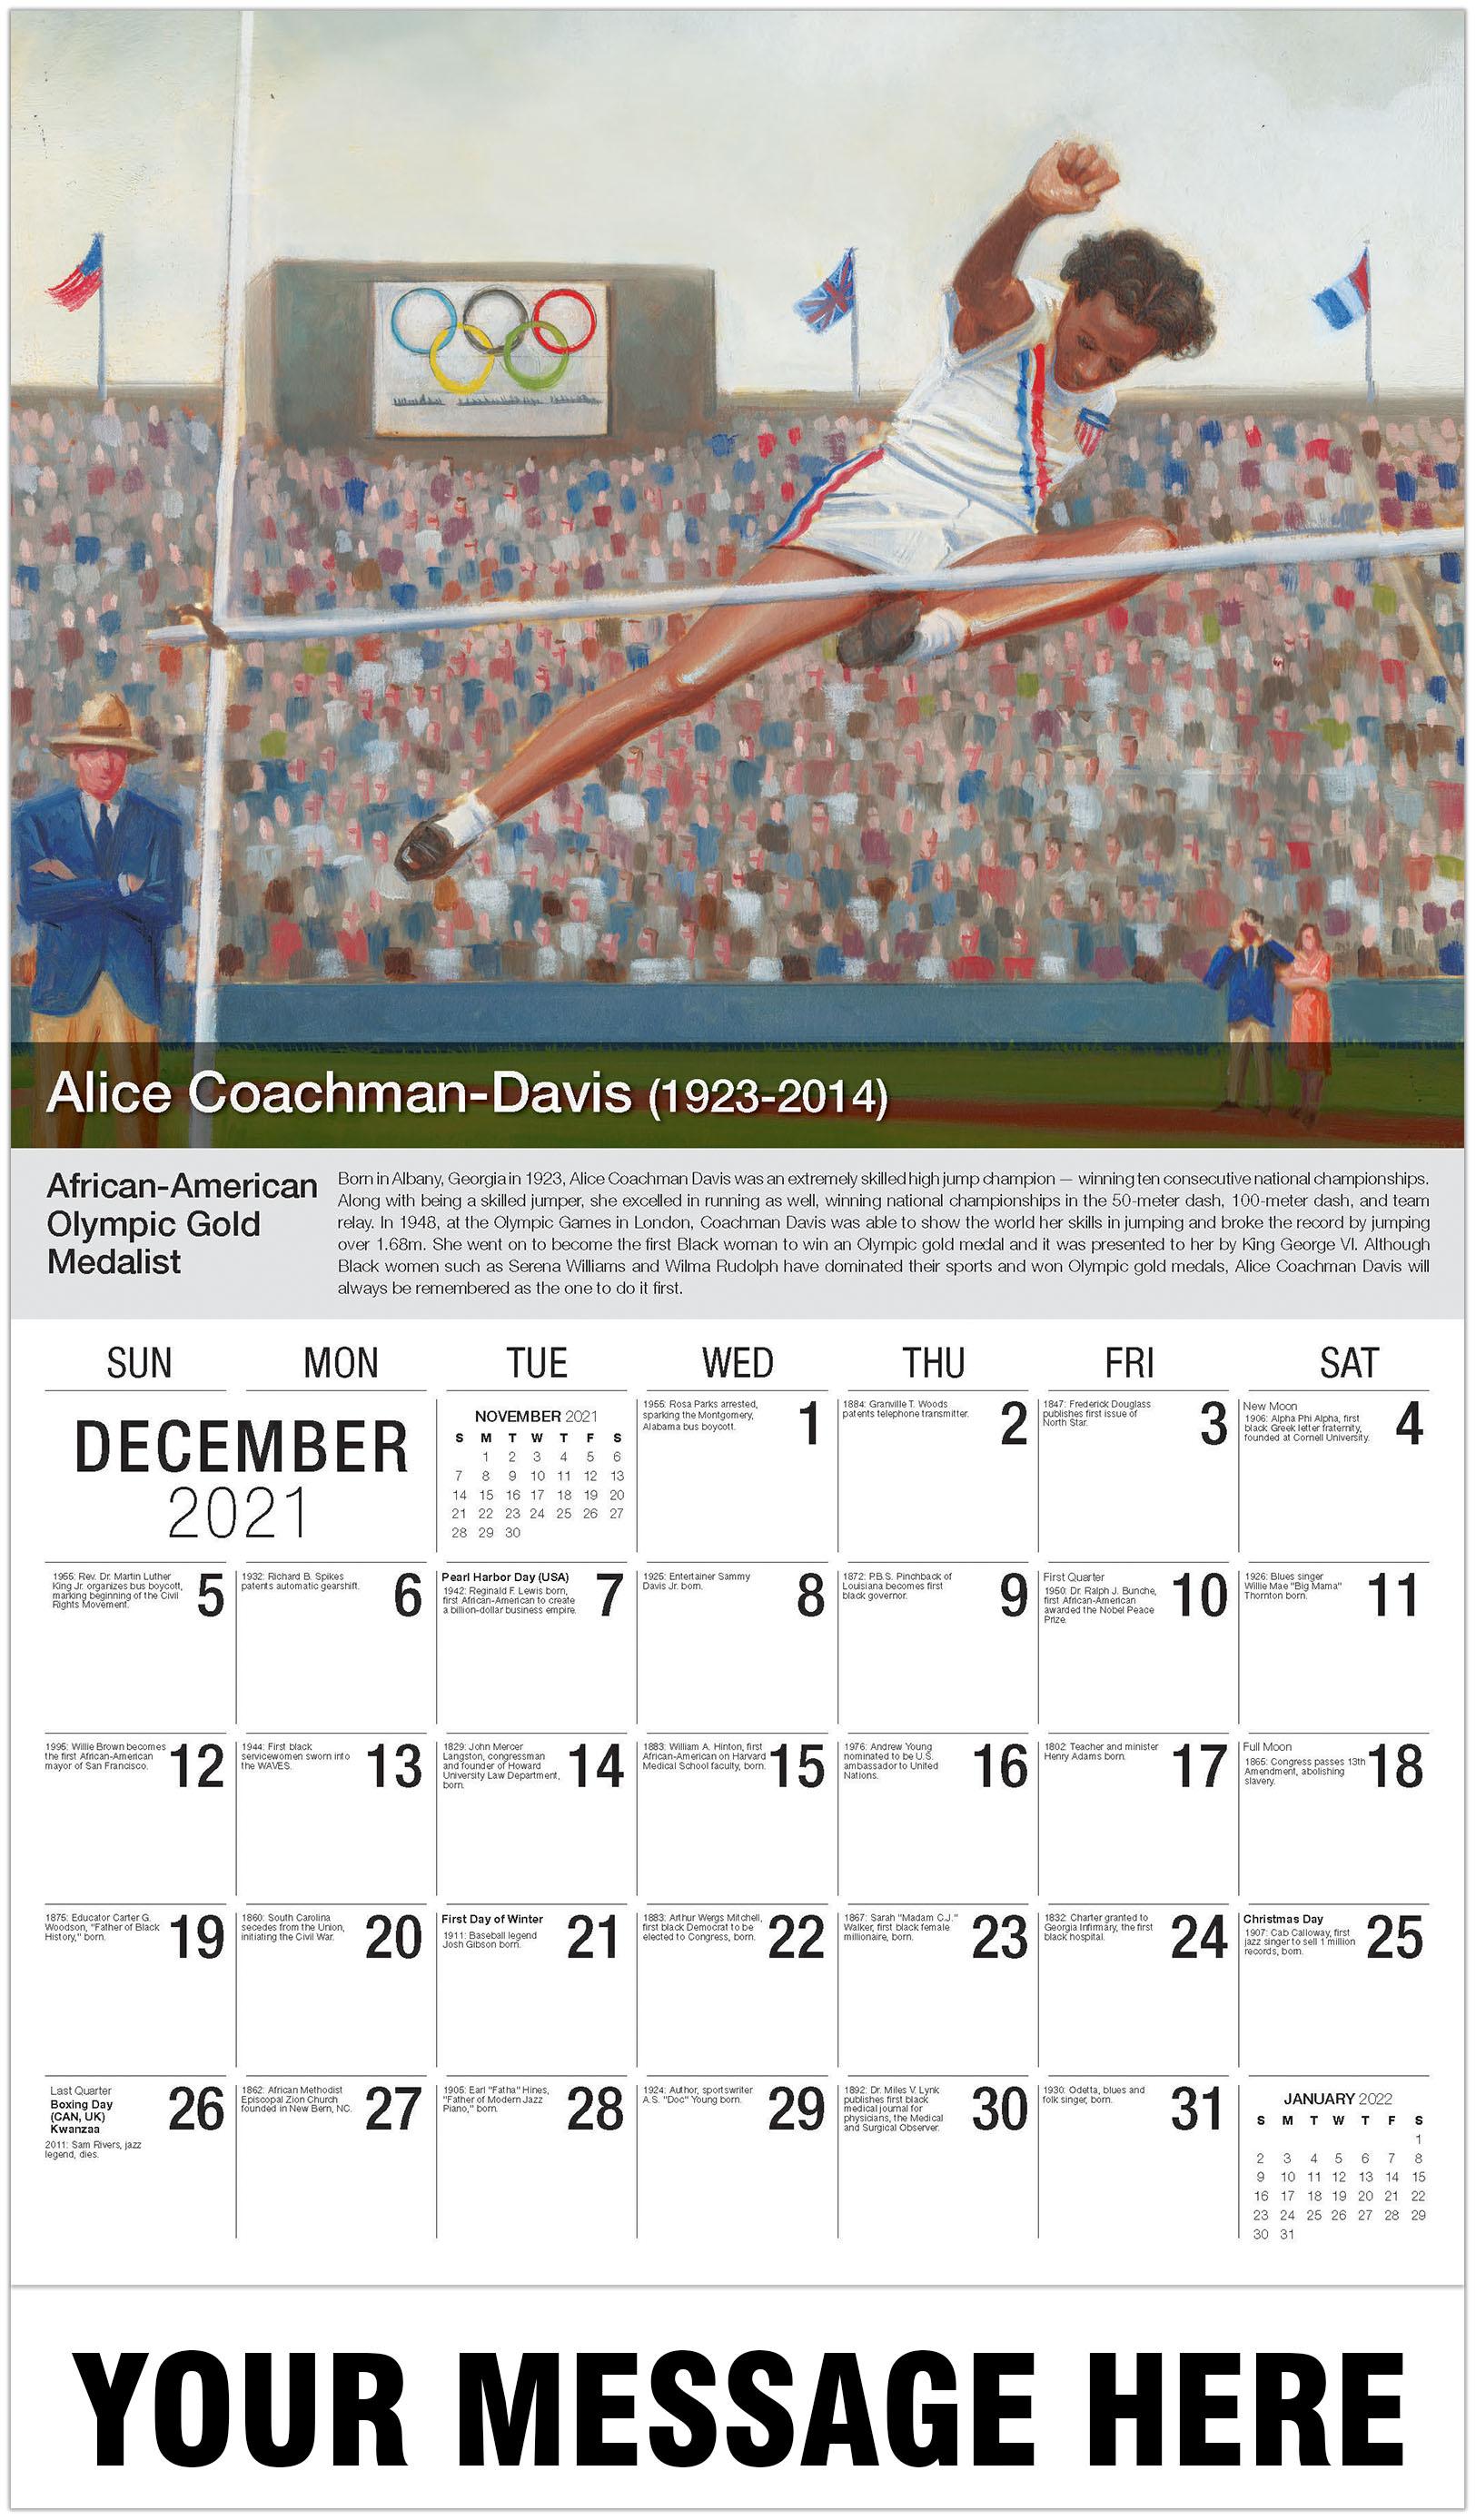 Alice Coachman - December 2021 - Black History 2021 Promotional Calendar